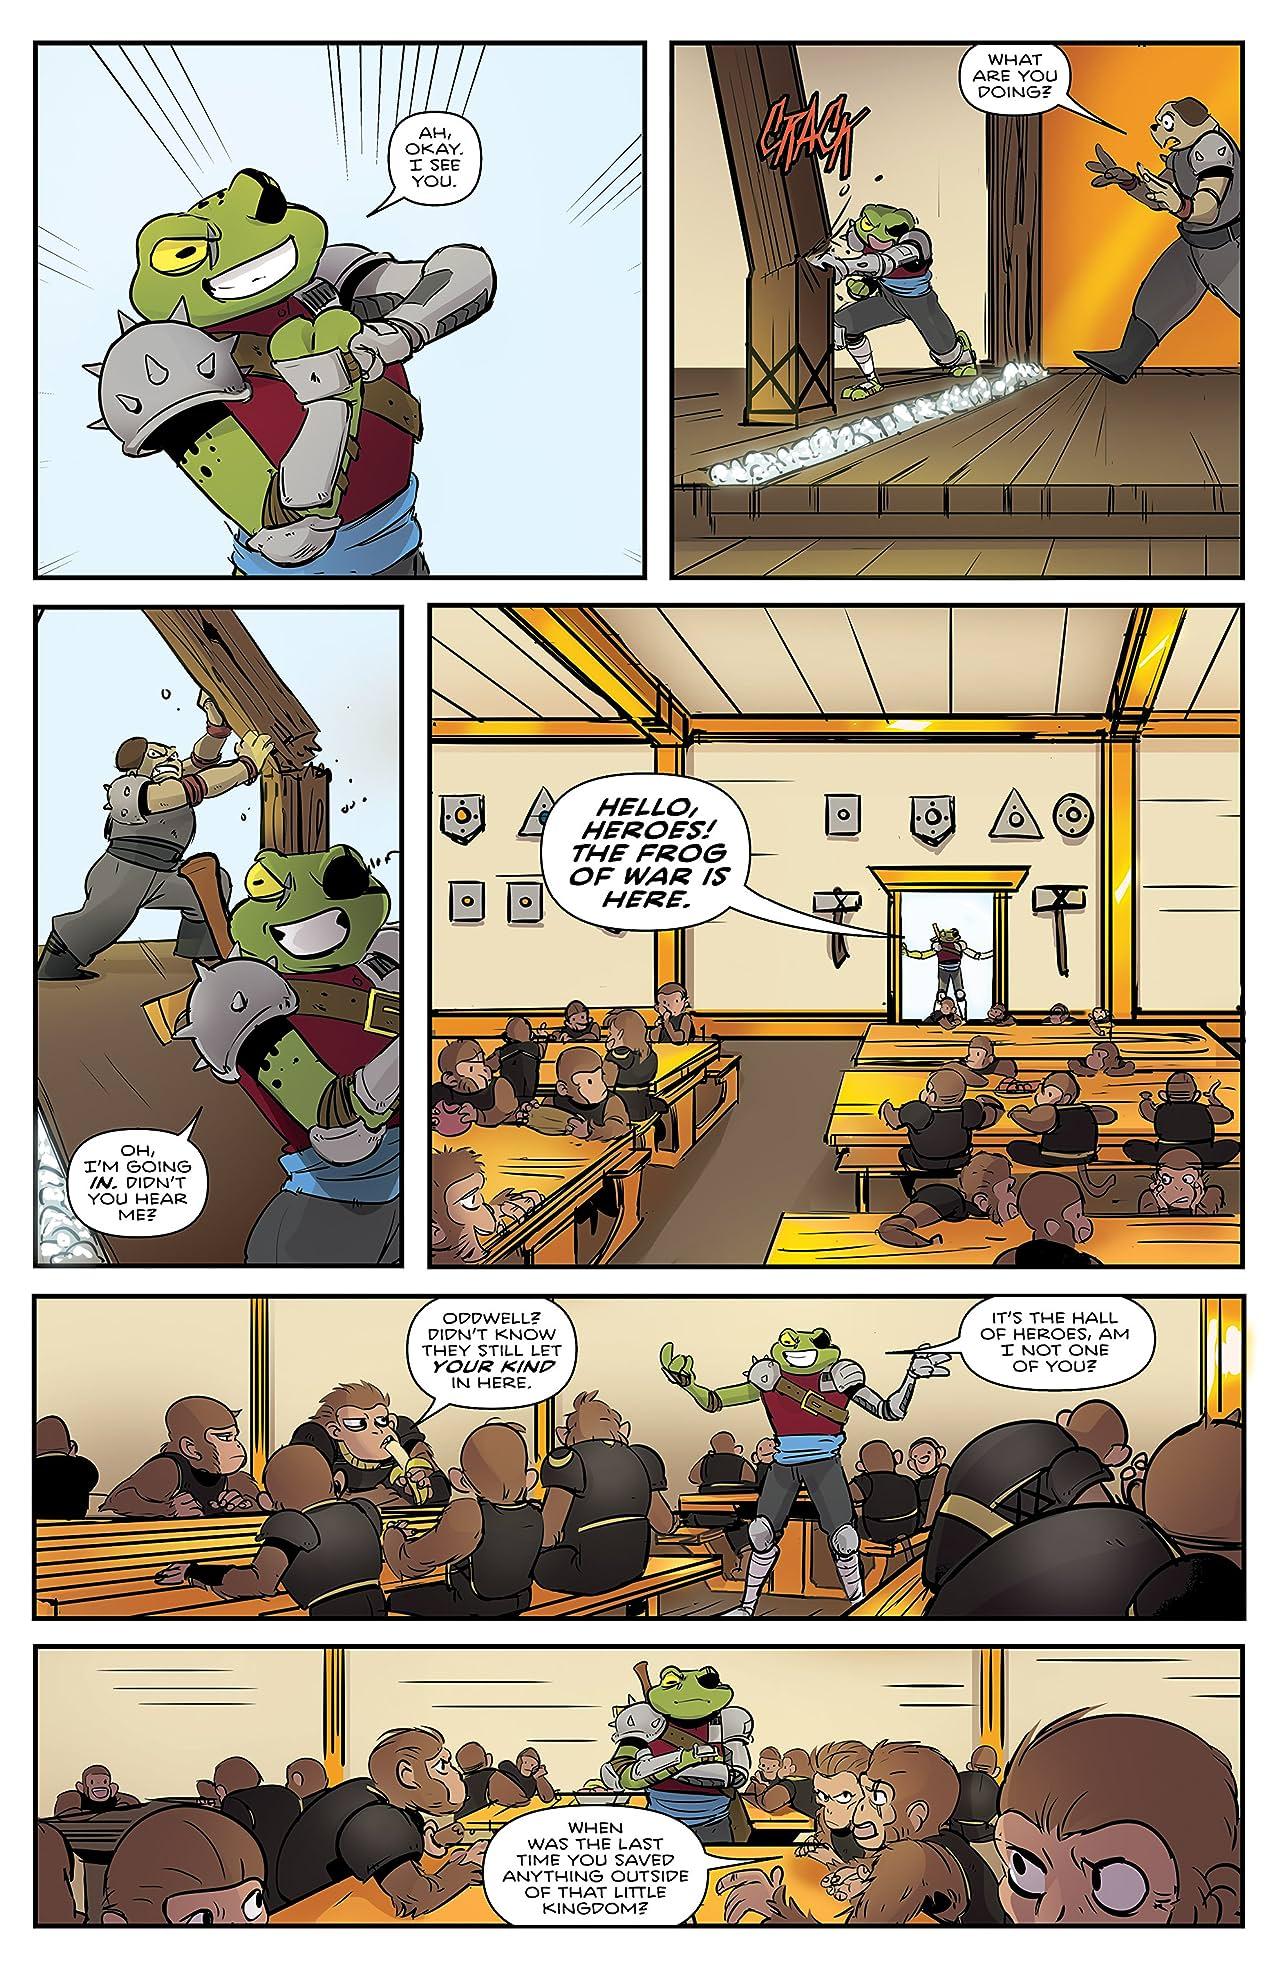 Oddwell #4